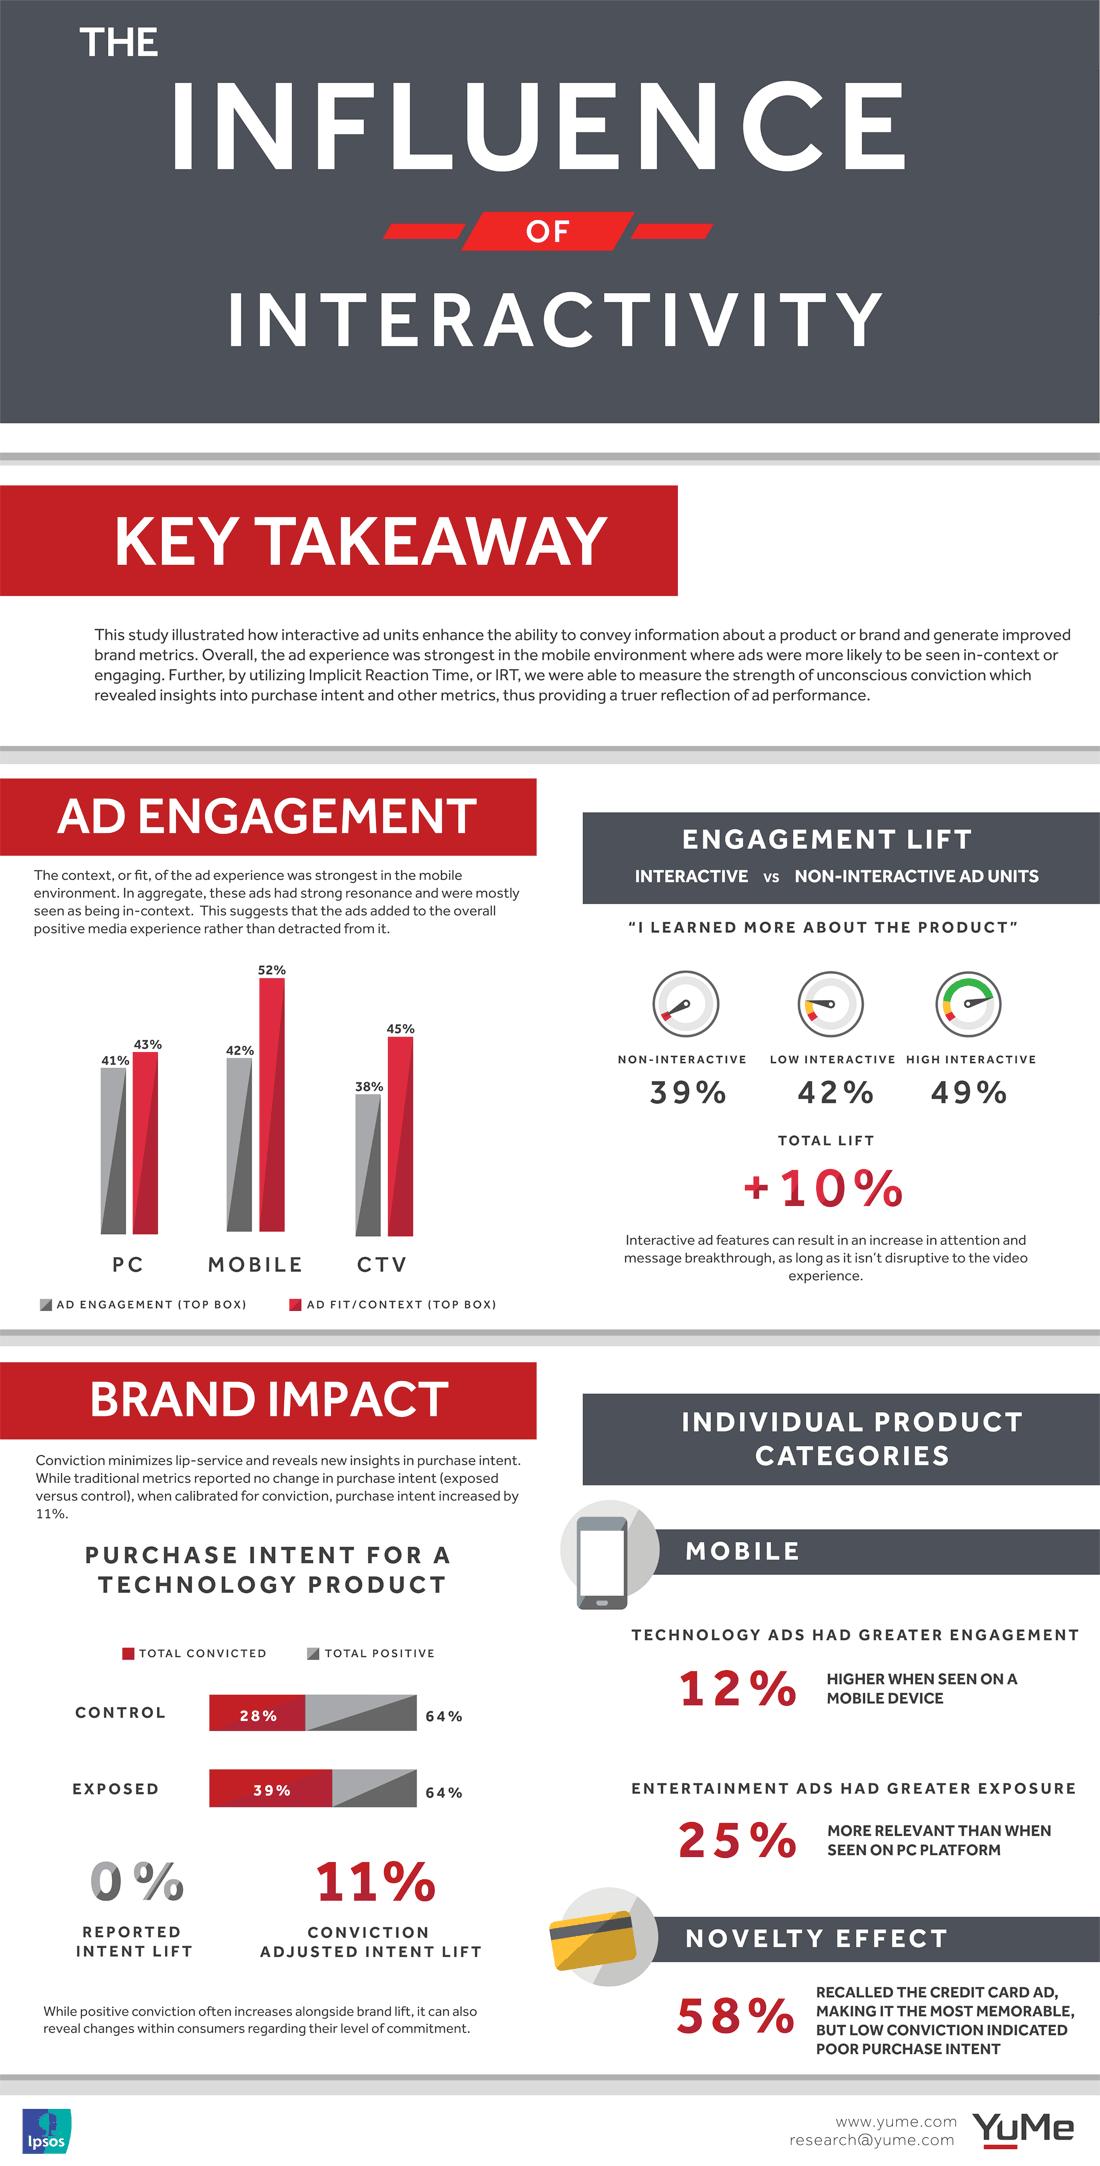 anuncios interactivos